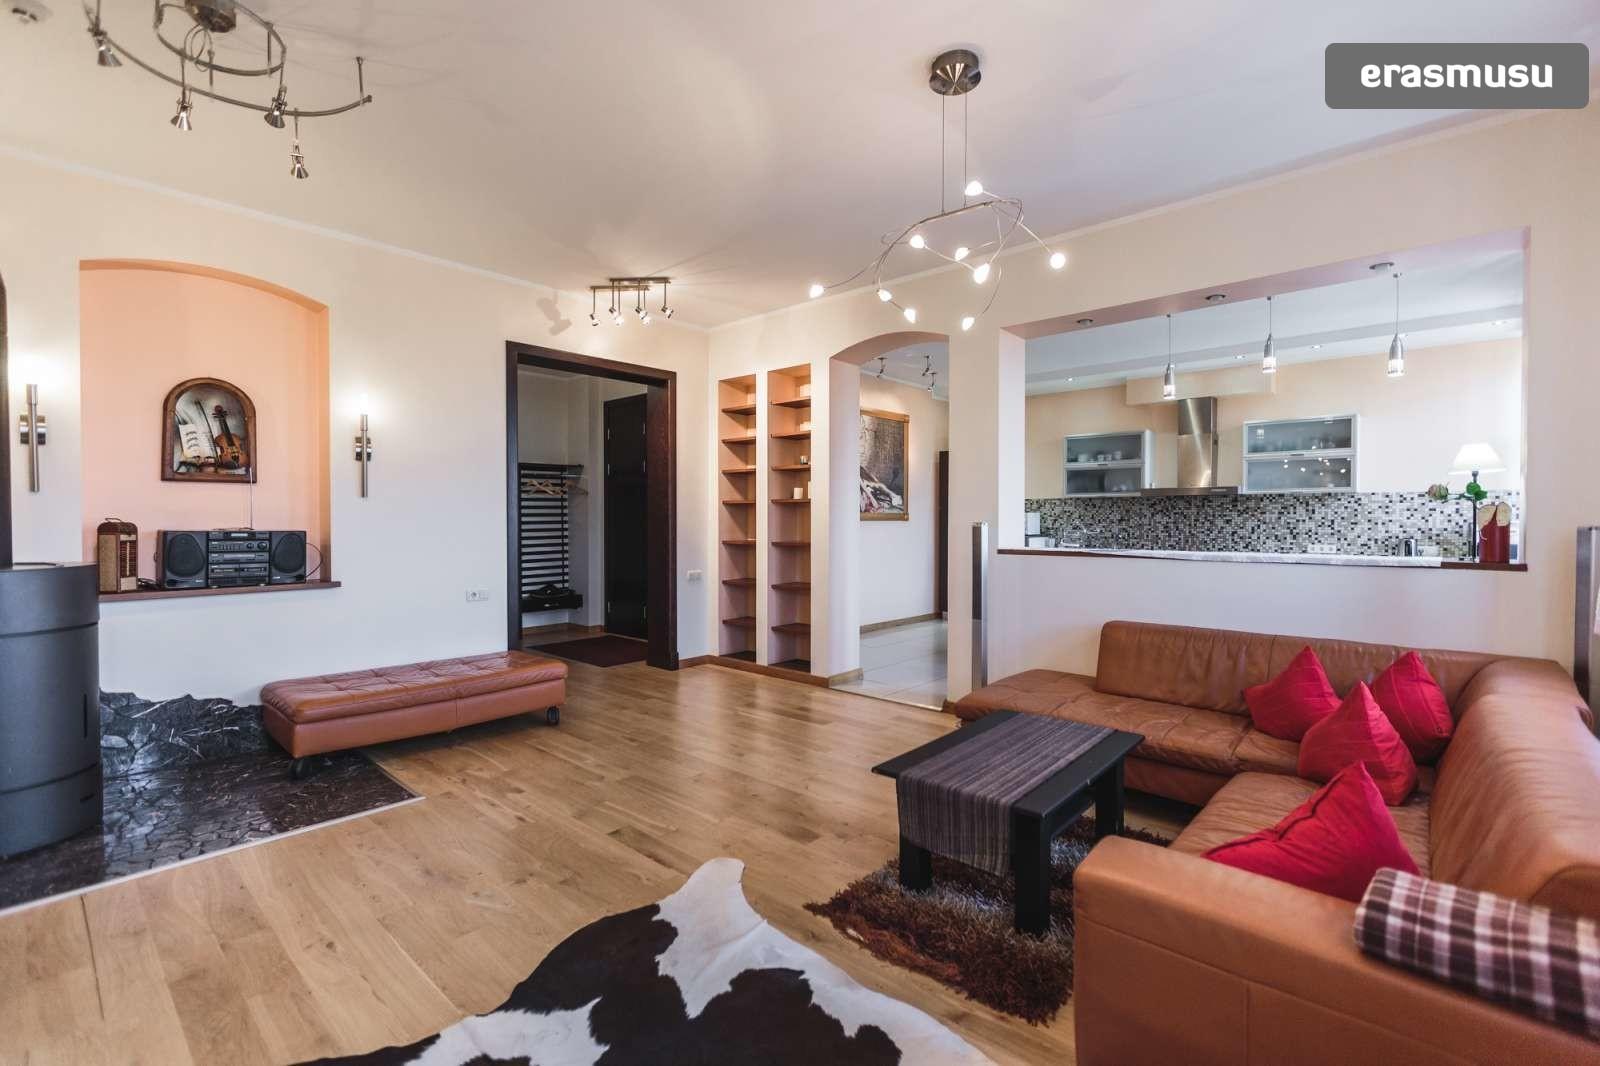 modern-4-bedroom-apartment-rent-centrs-ca4e89e3d4998f7e02a832fbc